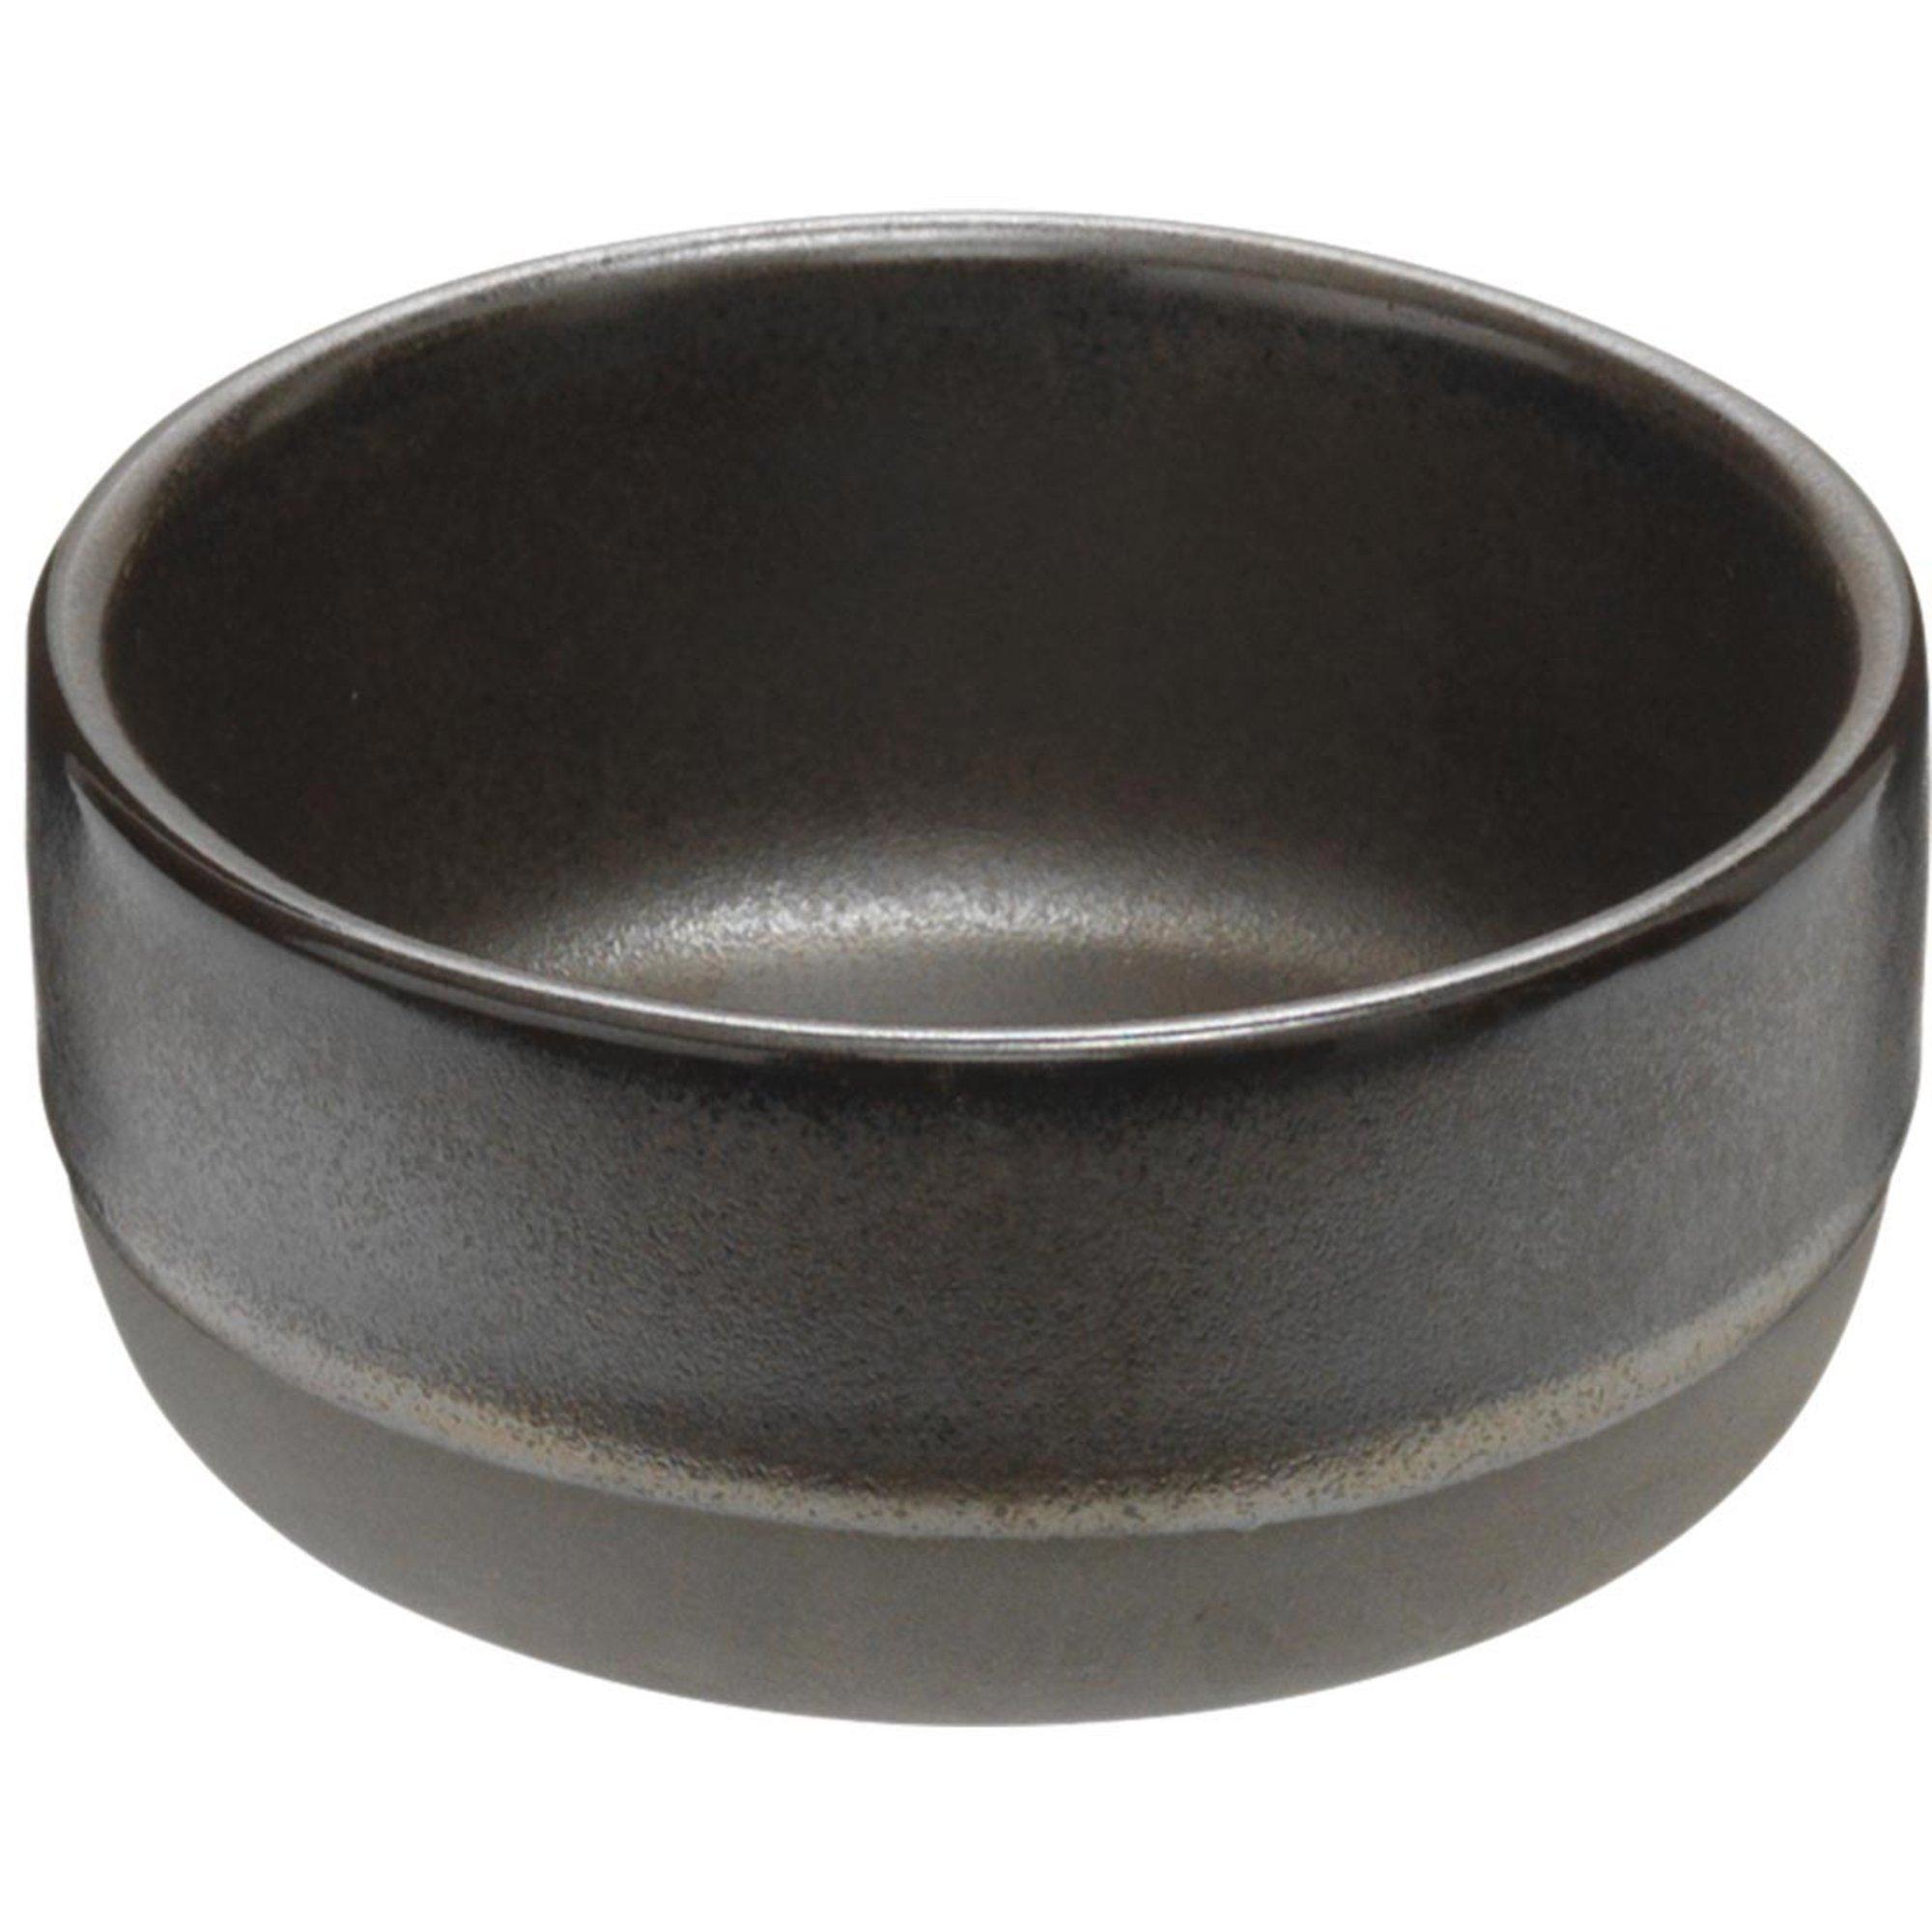 Aida RAW liten skål metallisk brun 9,5x4,5 cm.